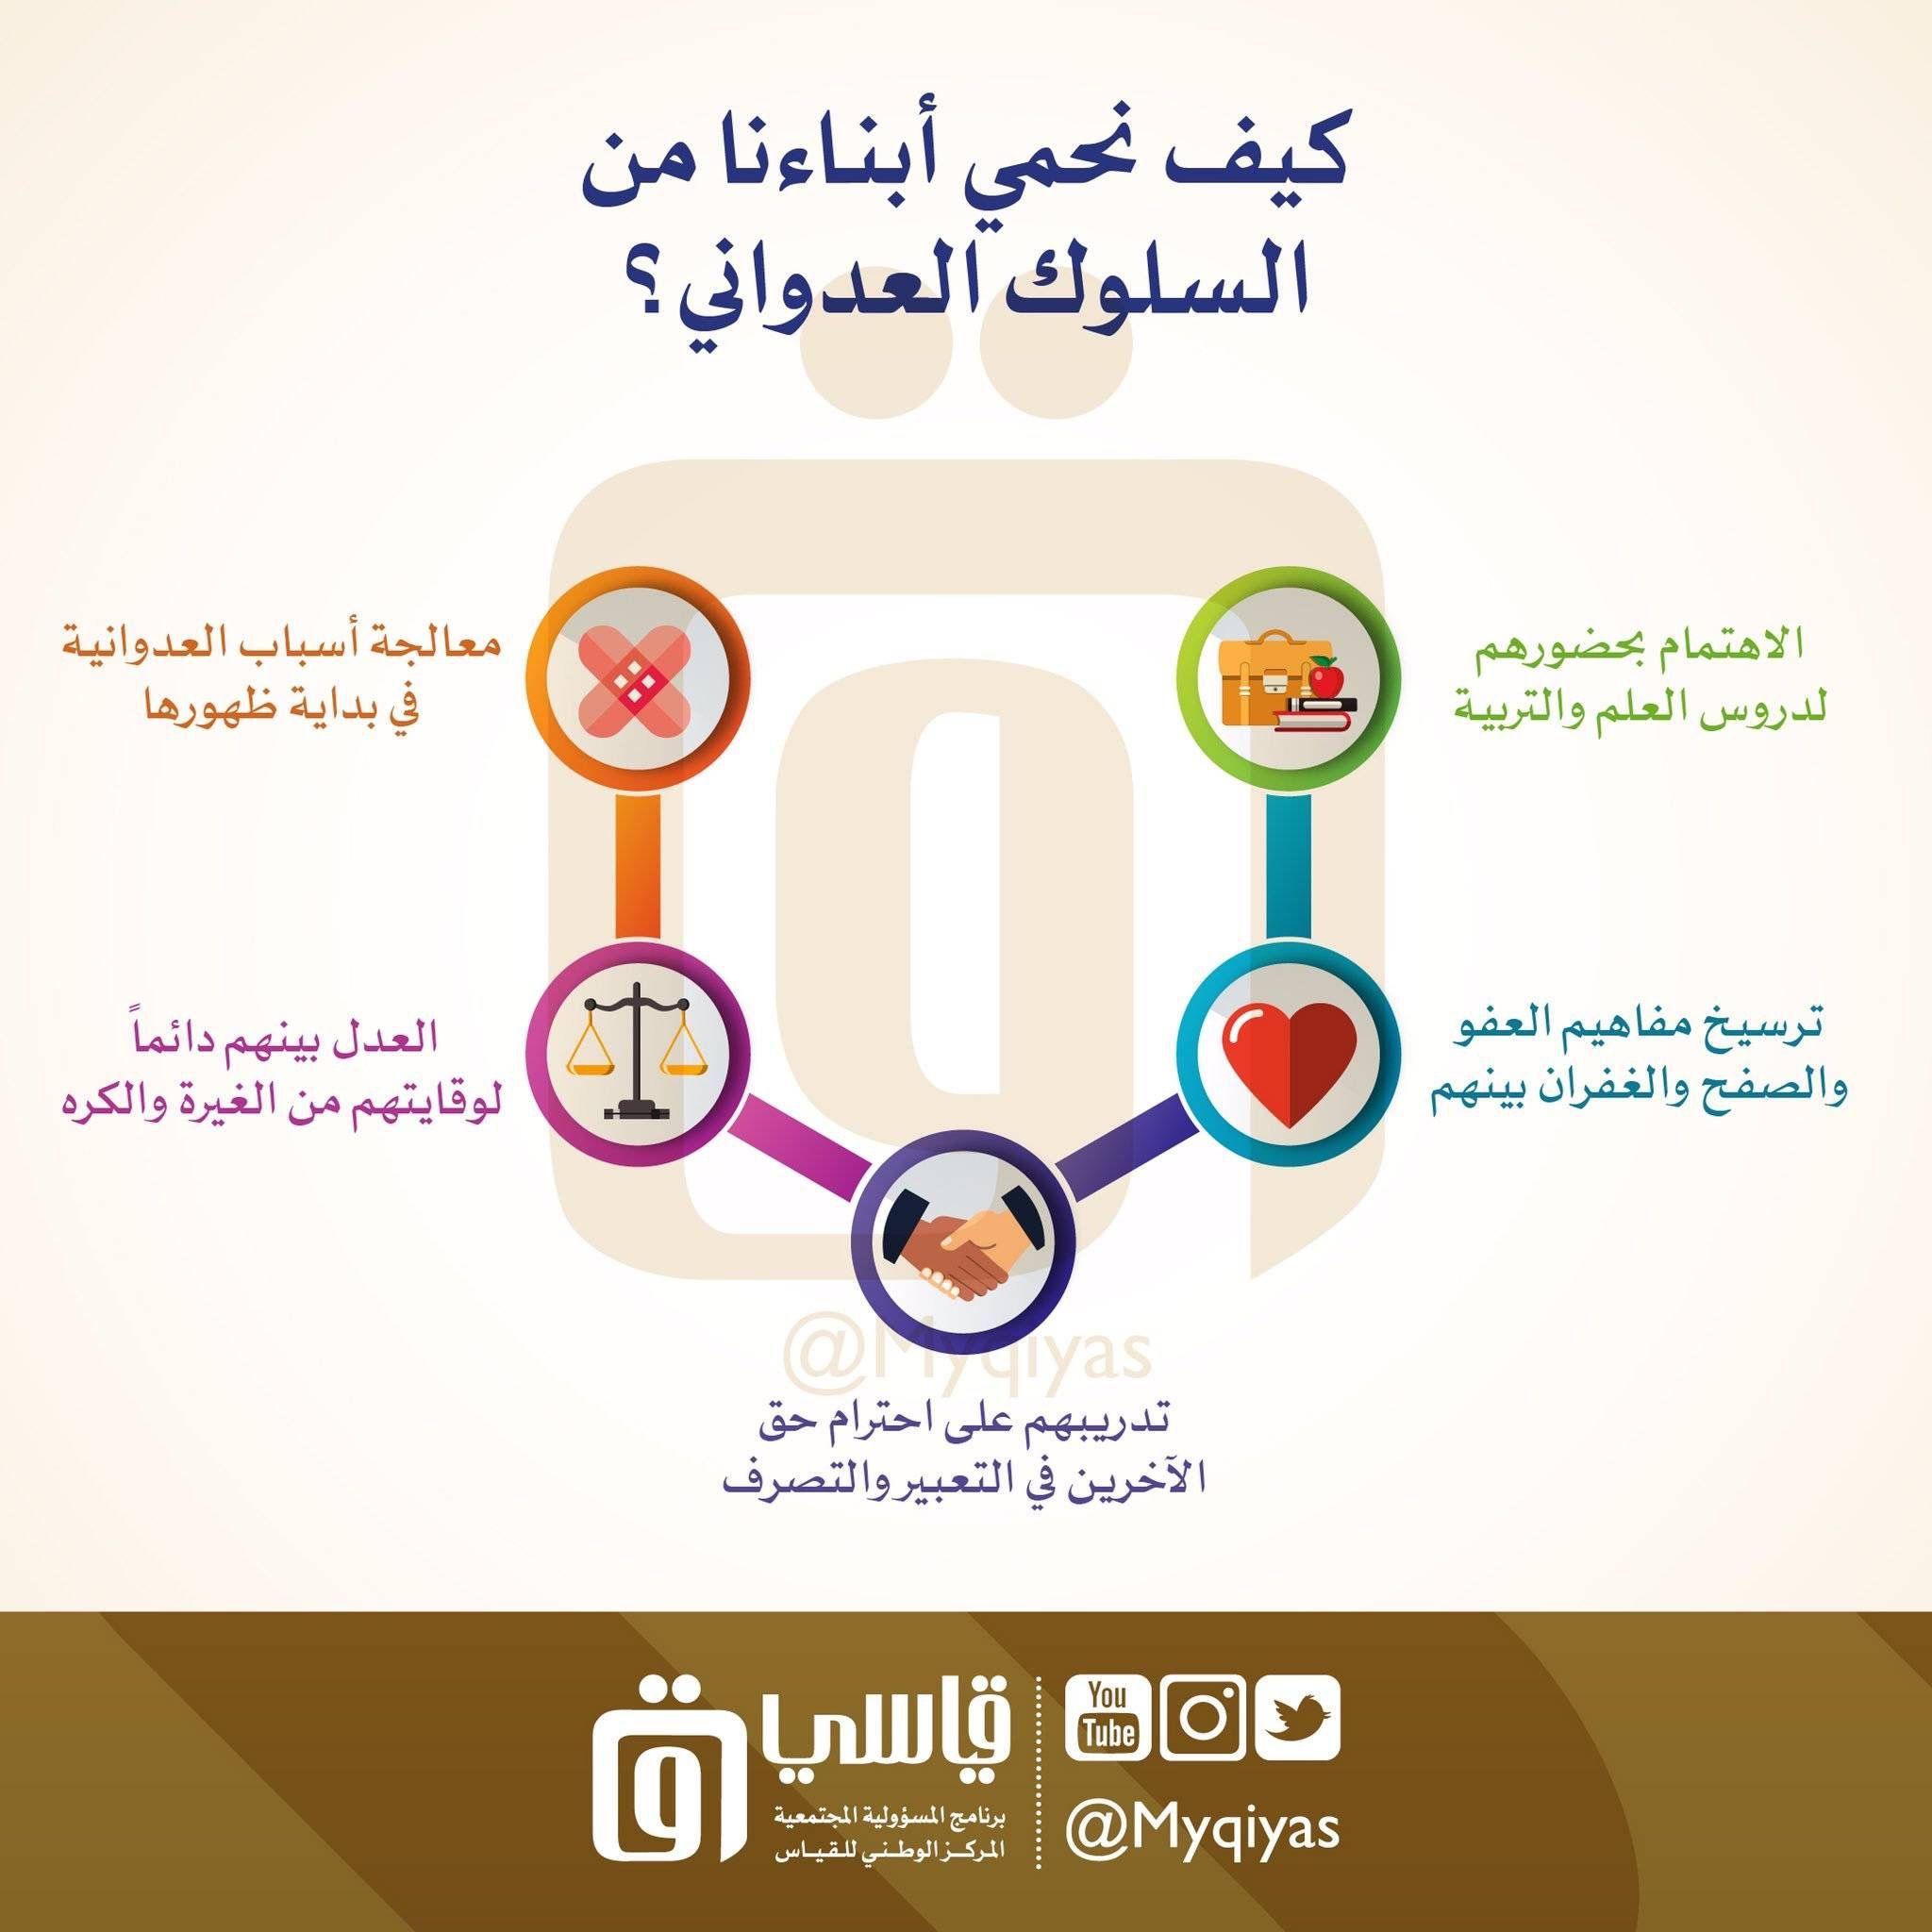 Pin By Hazem Musa On تطوير الذات Islamic Kids Activities Kids Education Islam For Kids